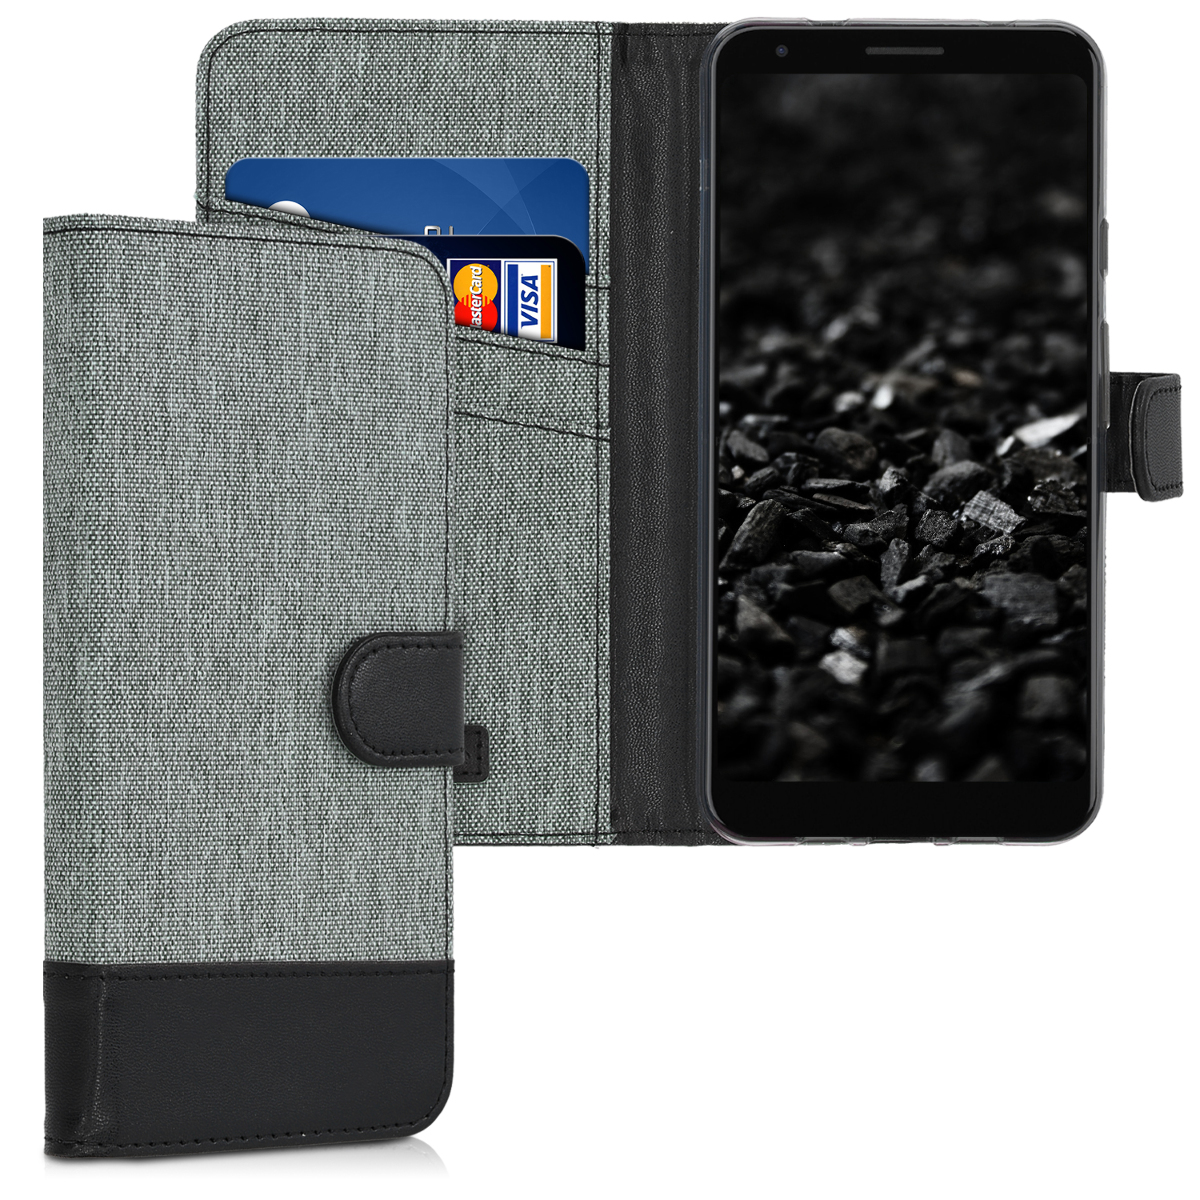 KW Θήκη Πορτοφόλι Google Pixel 3a XL - Grey / Black (48736.22)